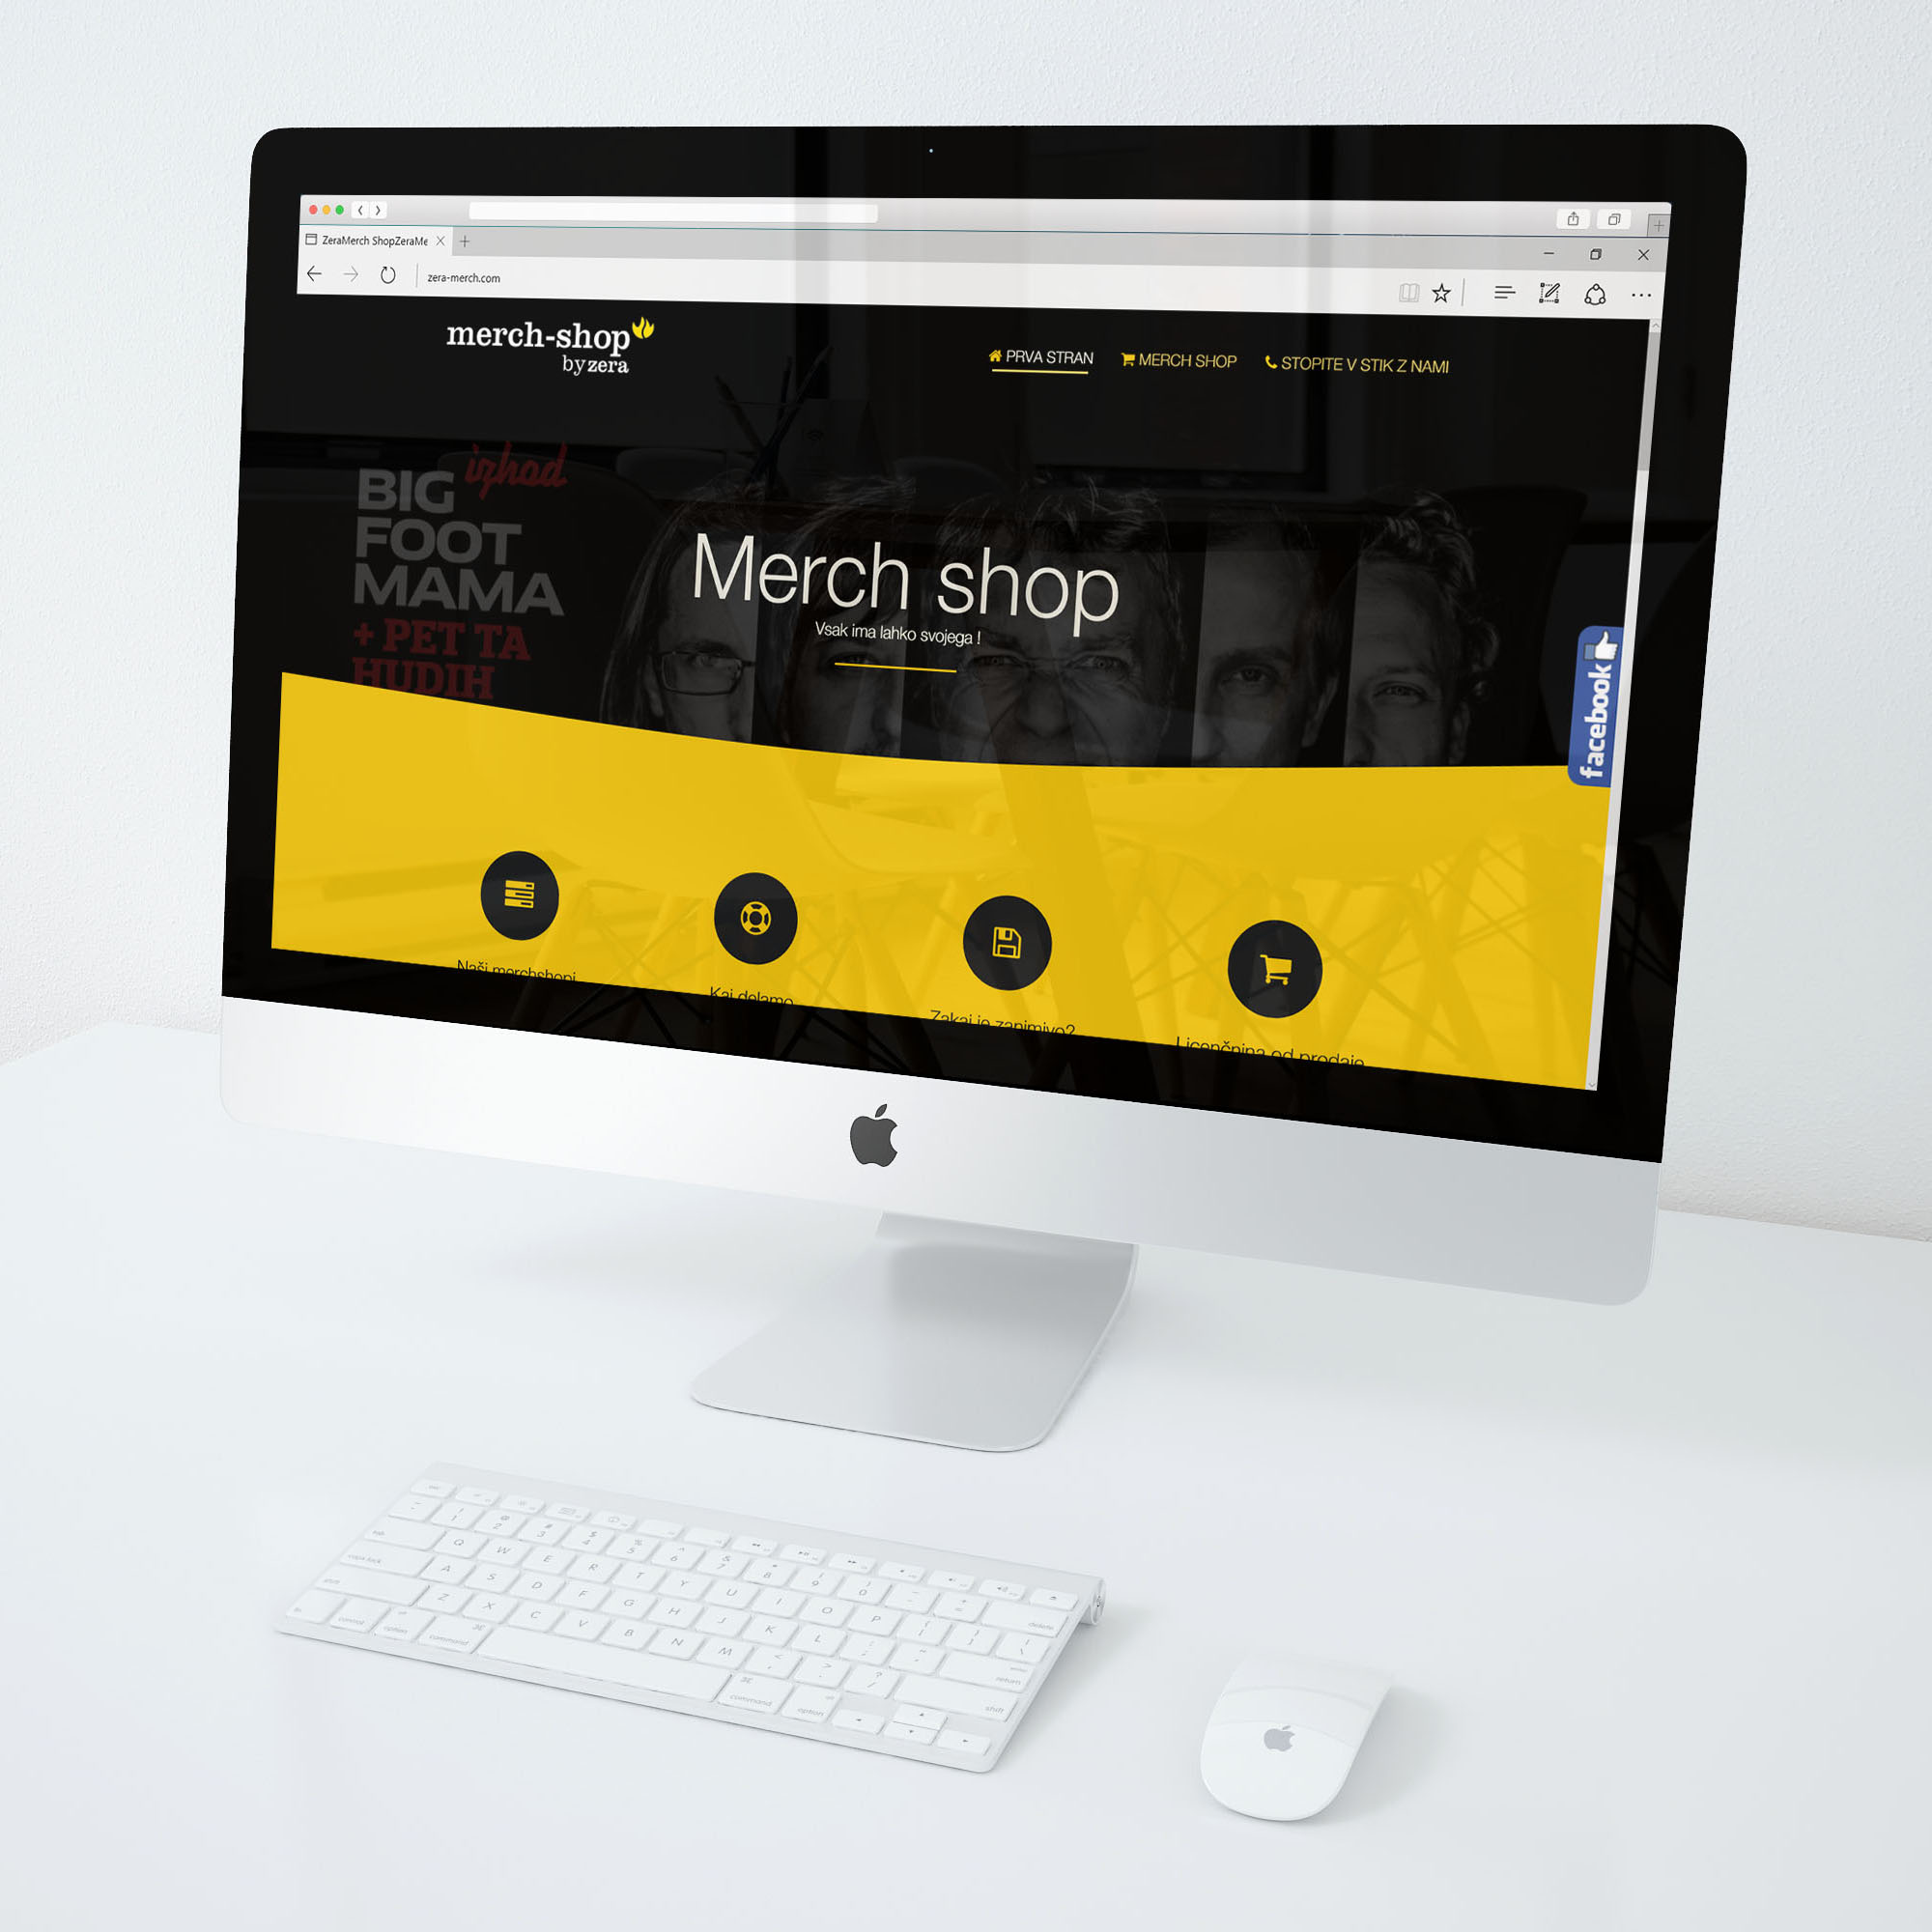 MerchShop - Predstavitvena stran